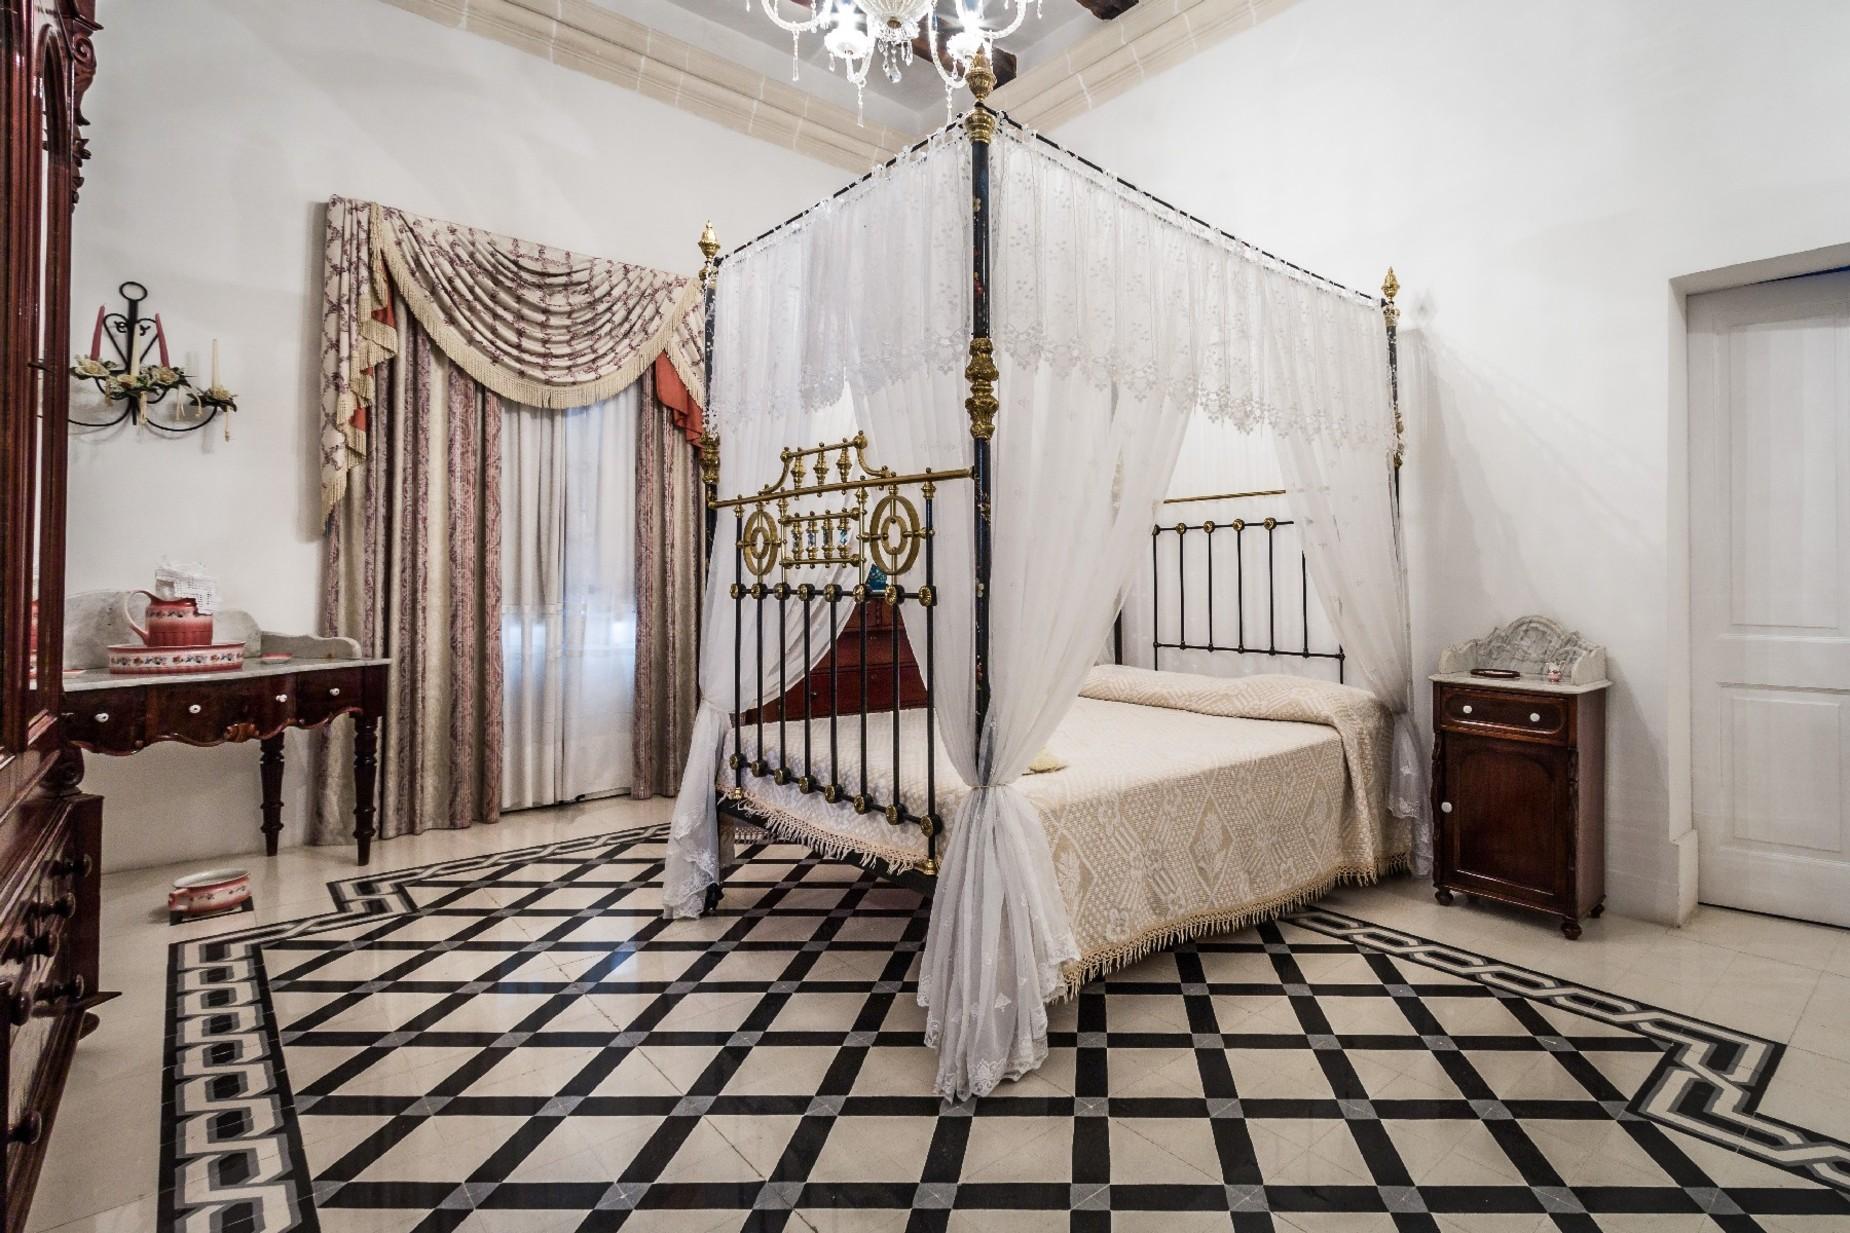 4 bed Town House For Sale in Birkirkara, Birkirkara - thumb 8